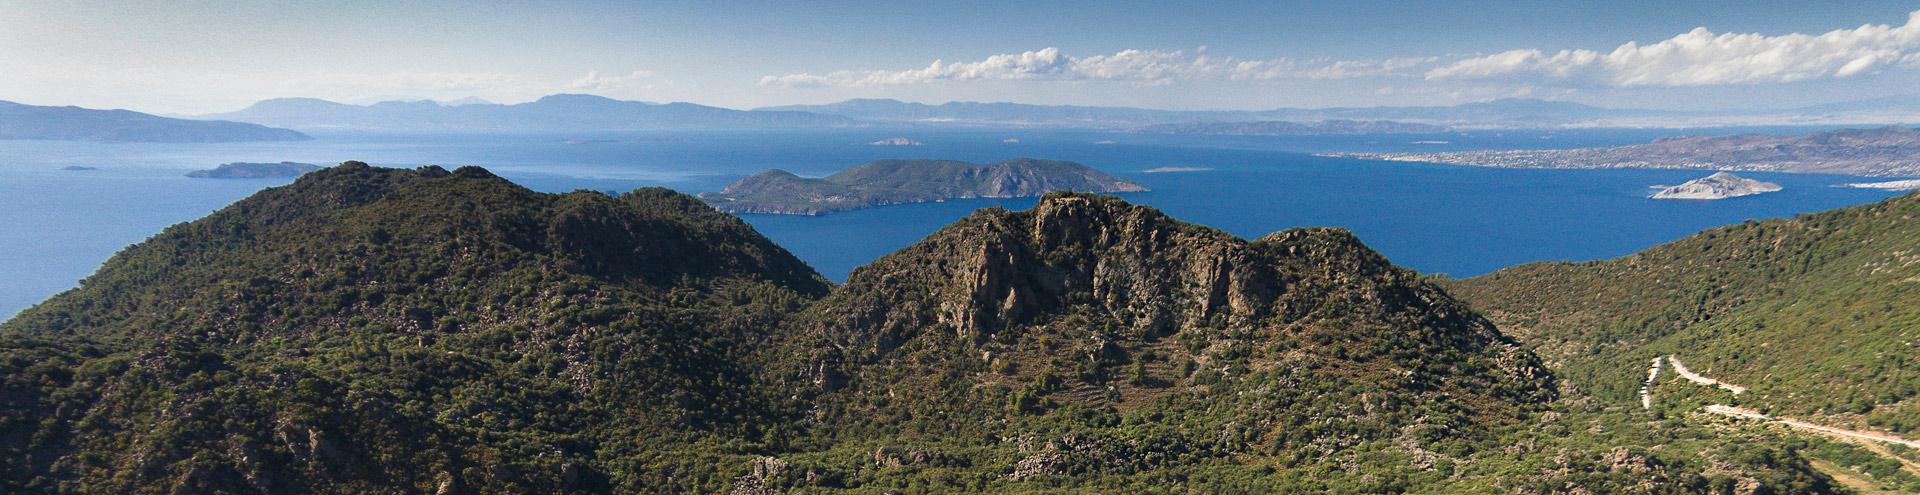 The Profitis Ilias volcano